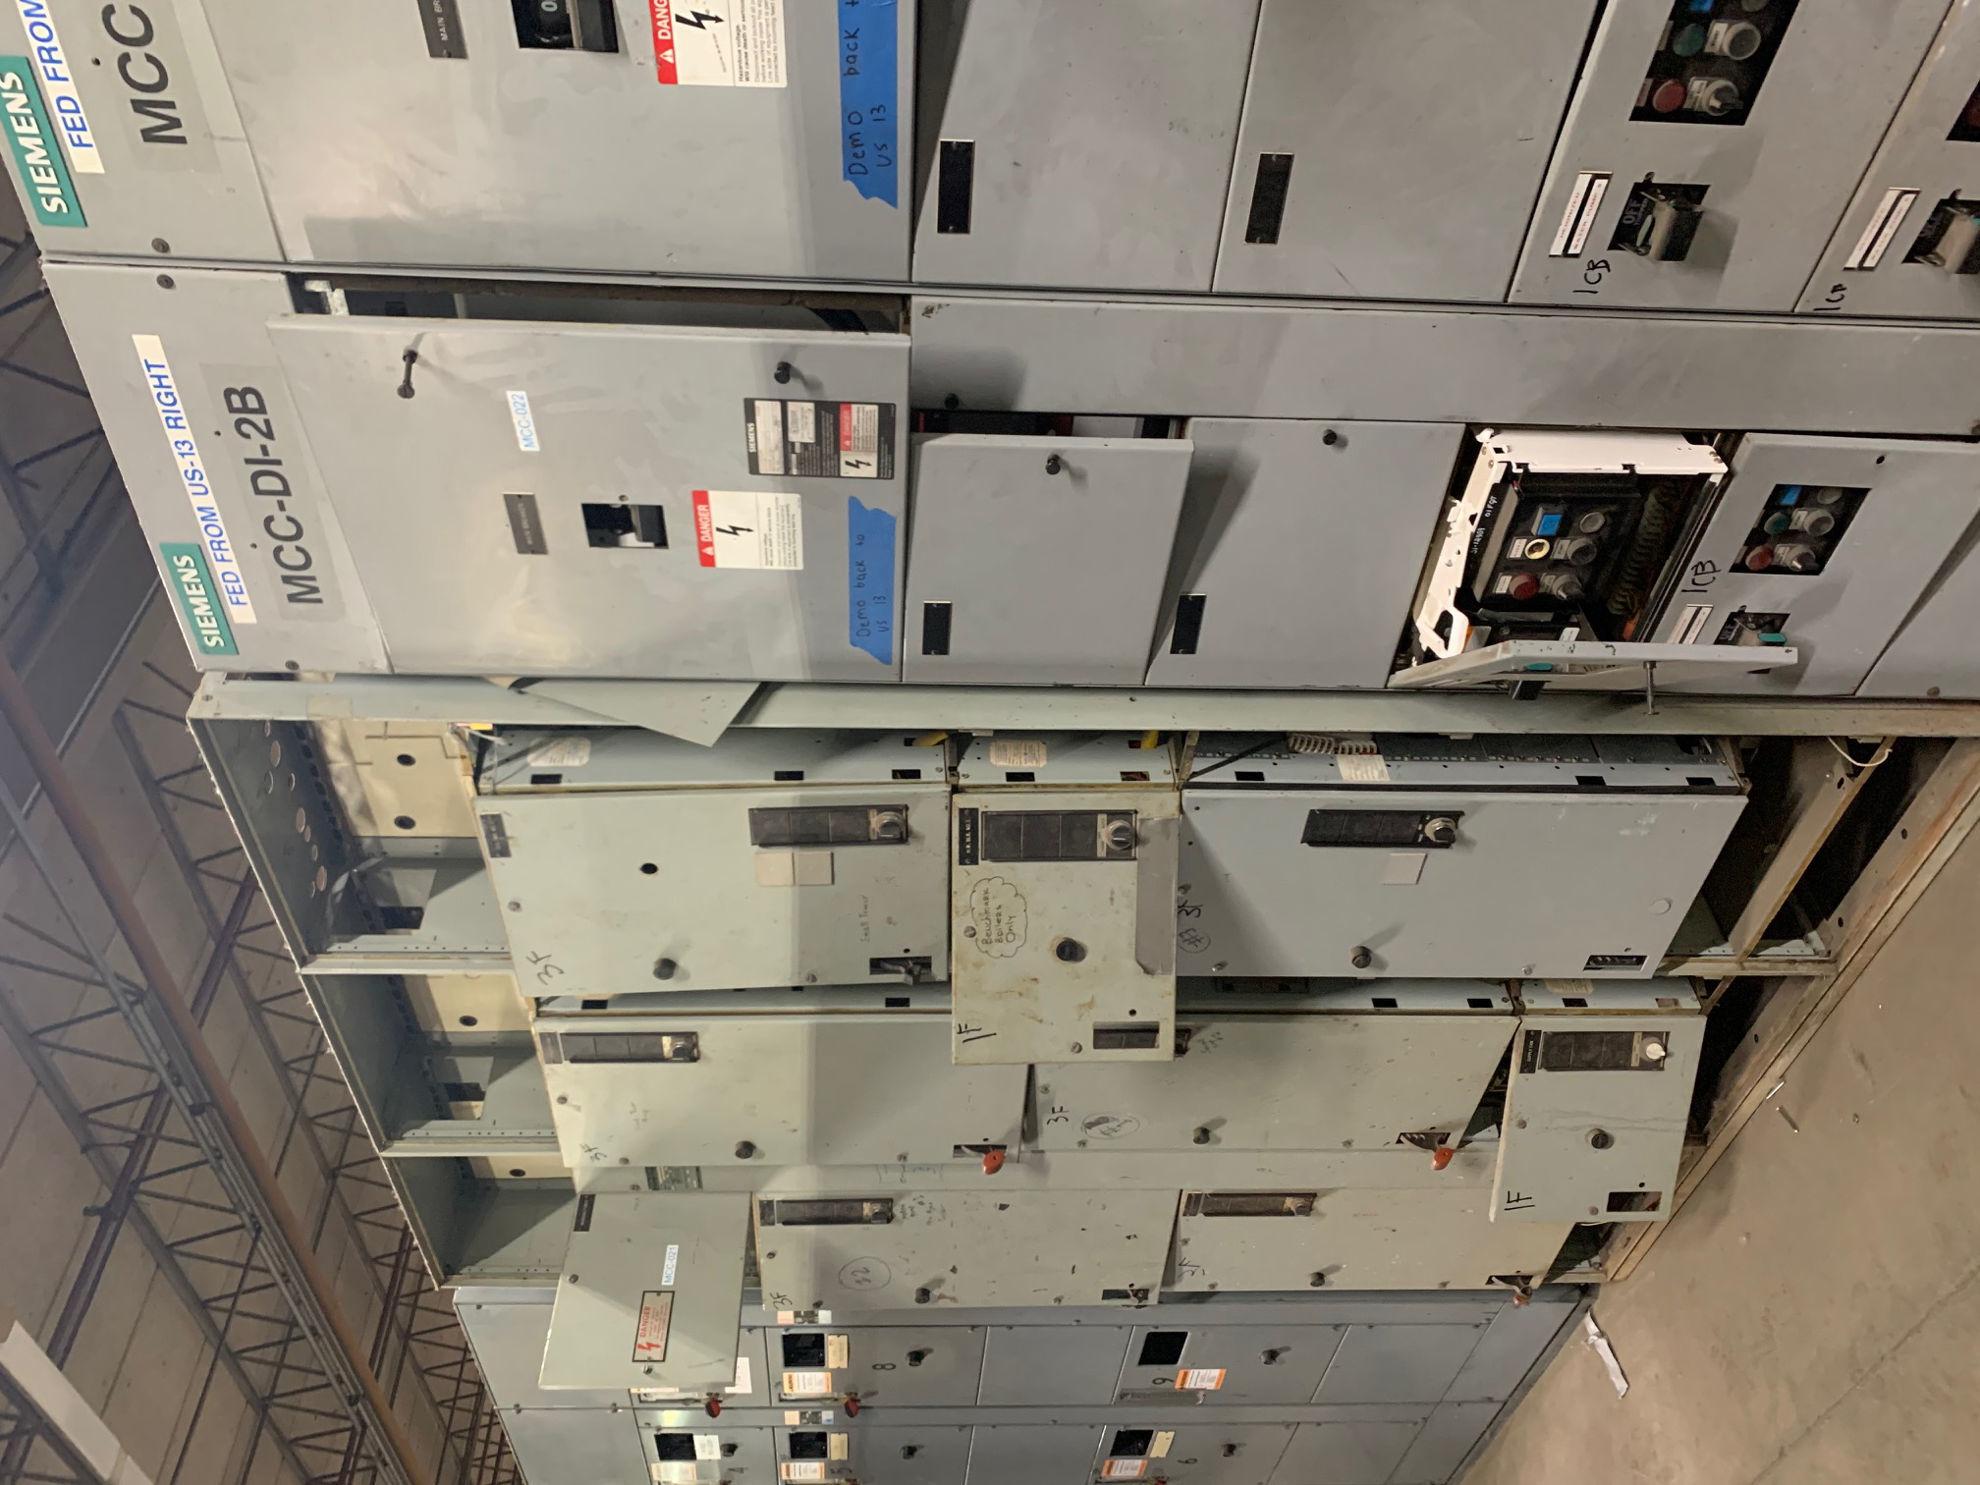 Picture of Siemens Model 95 MCC 225 Amp Breaker Main 480Y/277 Volt